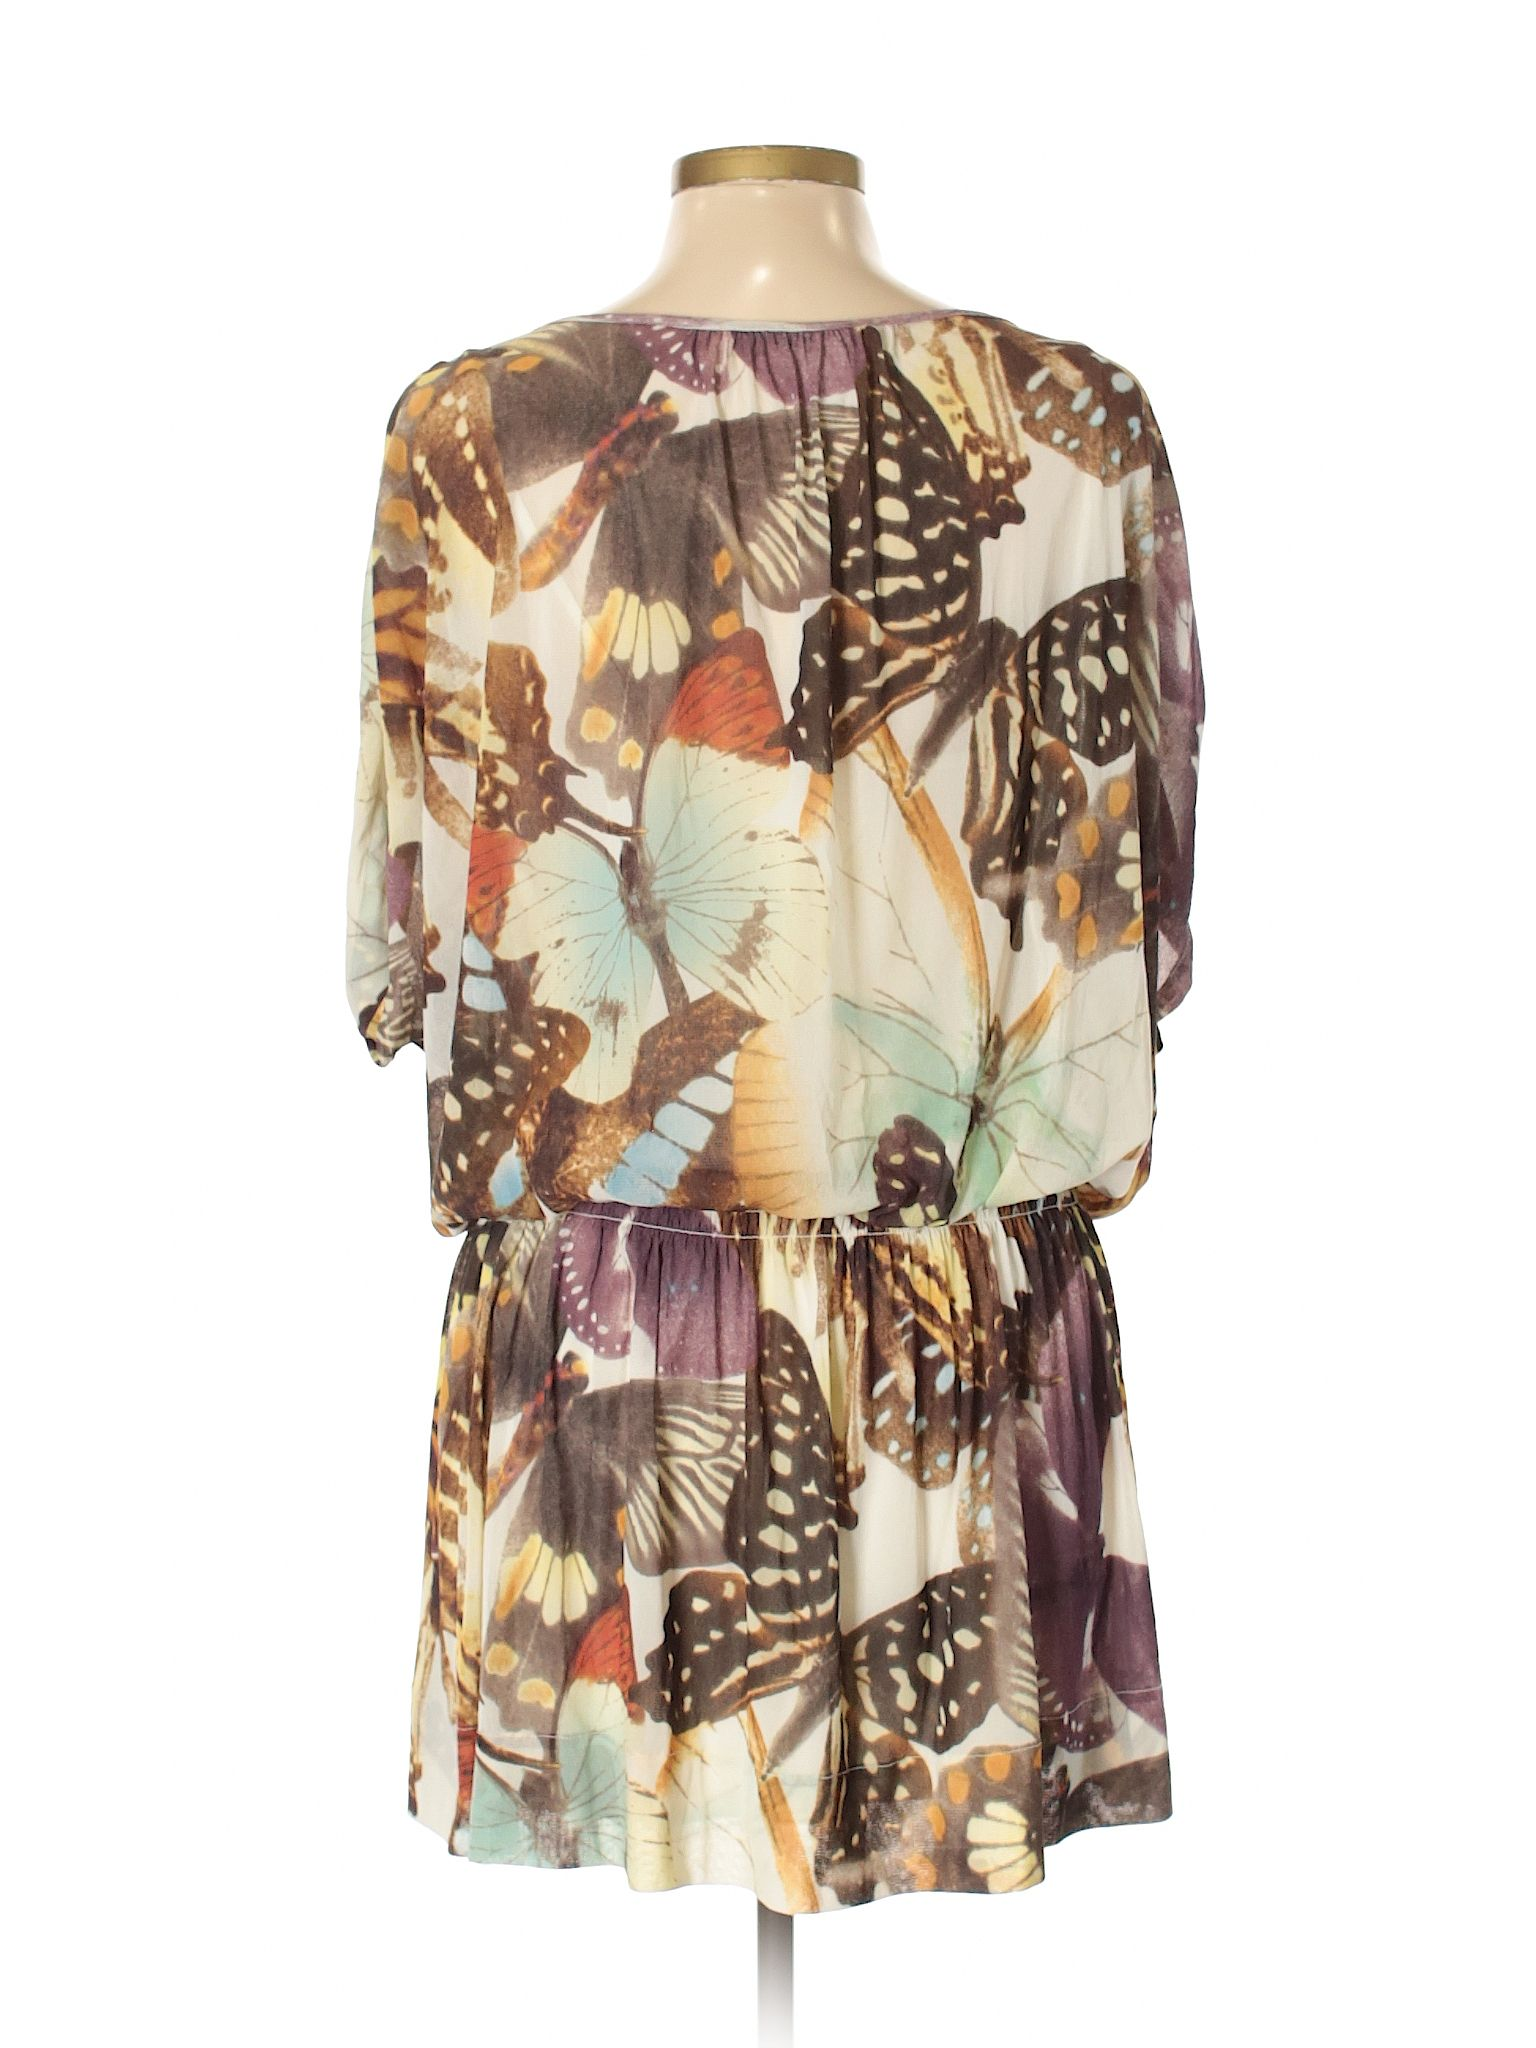 a36a18fb4 Vivienne Tam Casual Dress: Size 12.00 Ivory Women's Dresses - $93.99